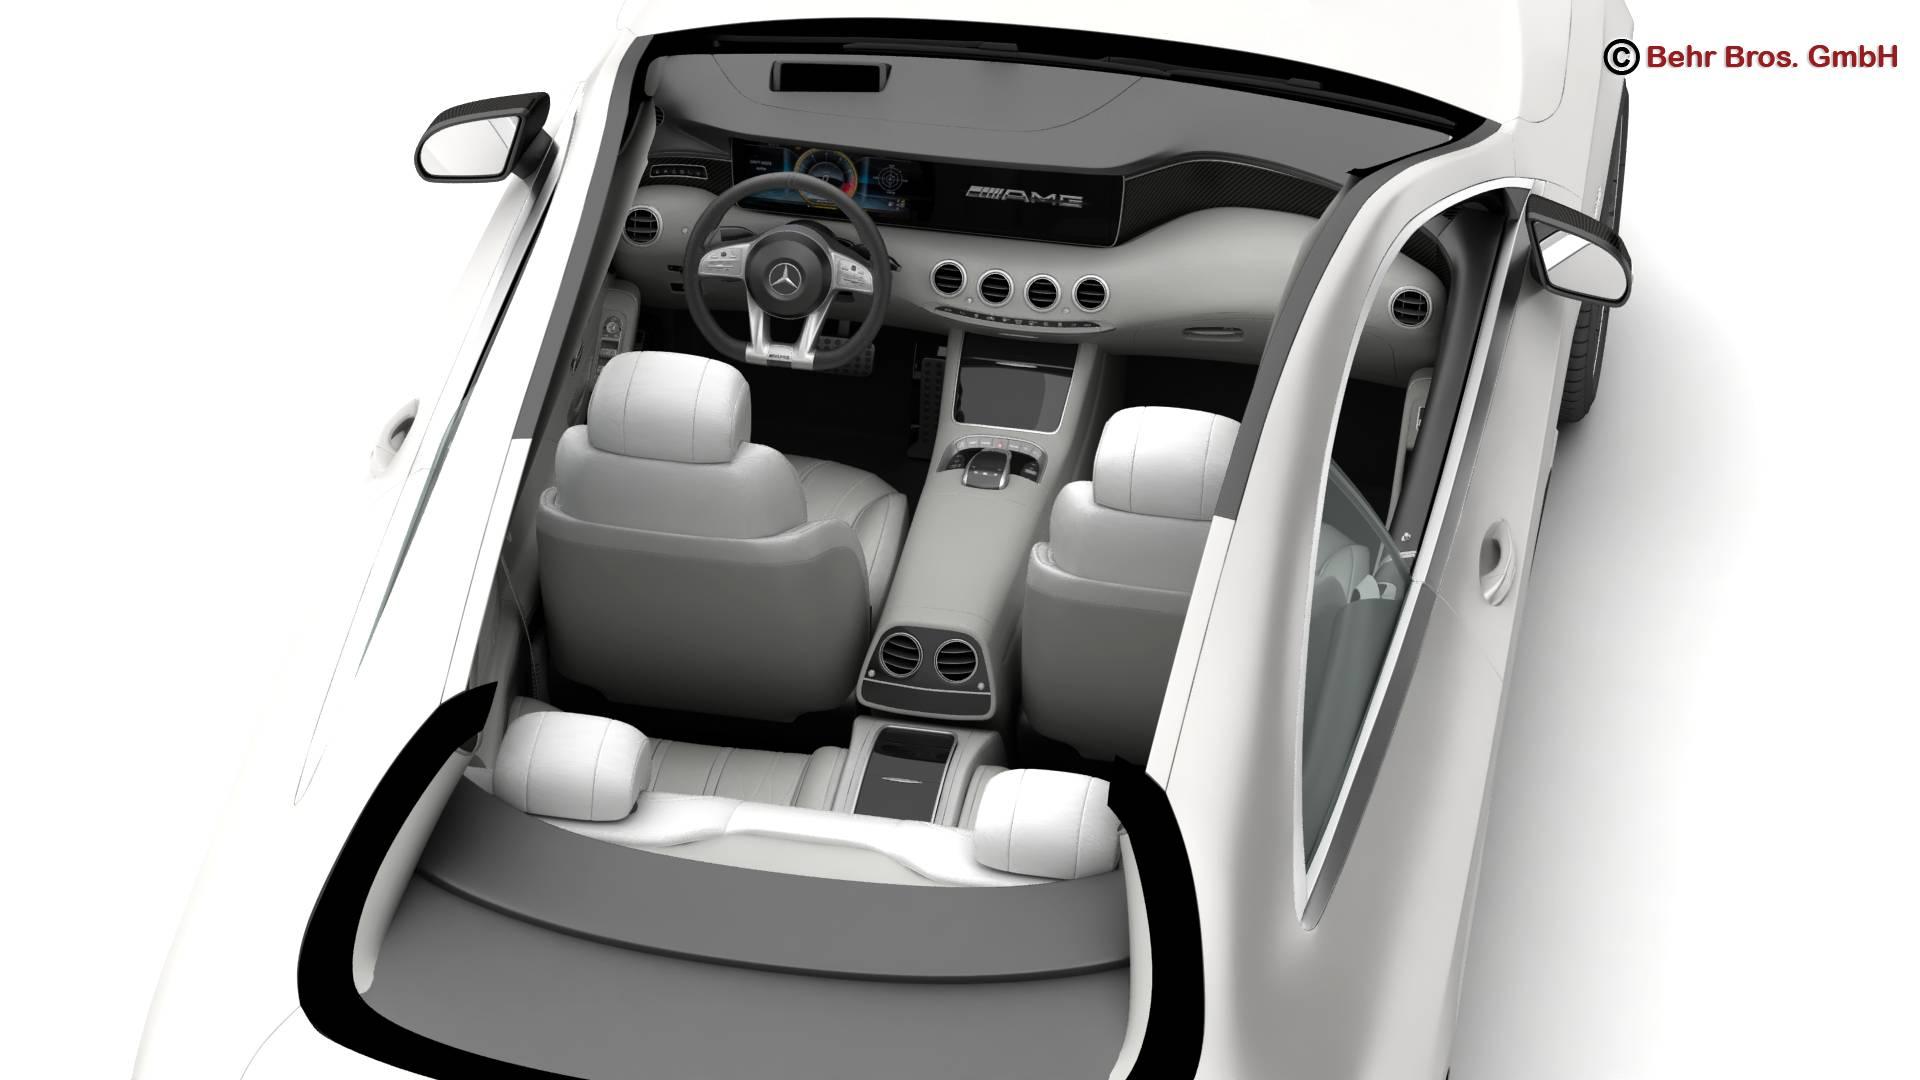 mercedes s class coupe amg s63 2018 3d model 3ds max fbx c4d lwo ma mb obj 274101